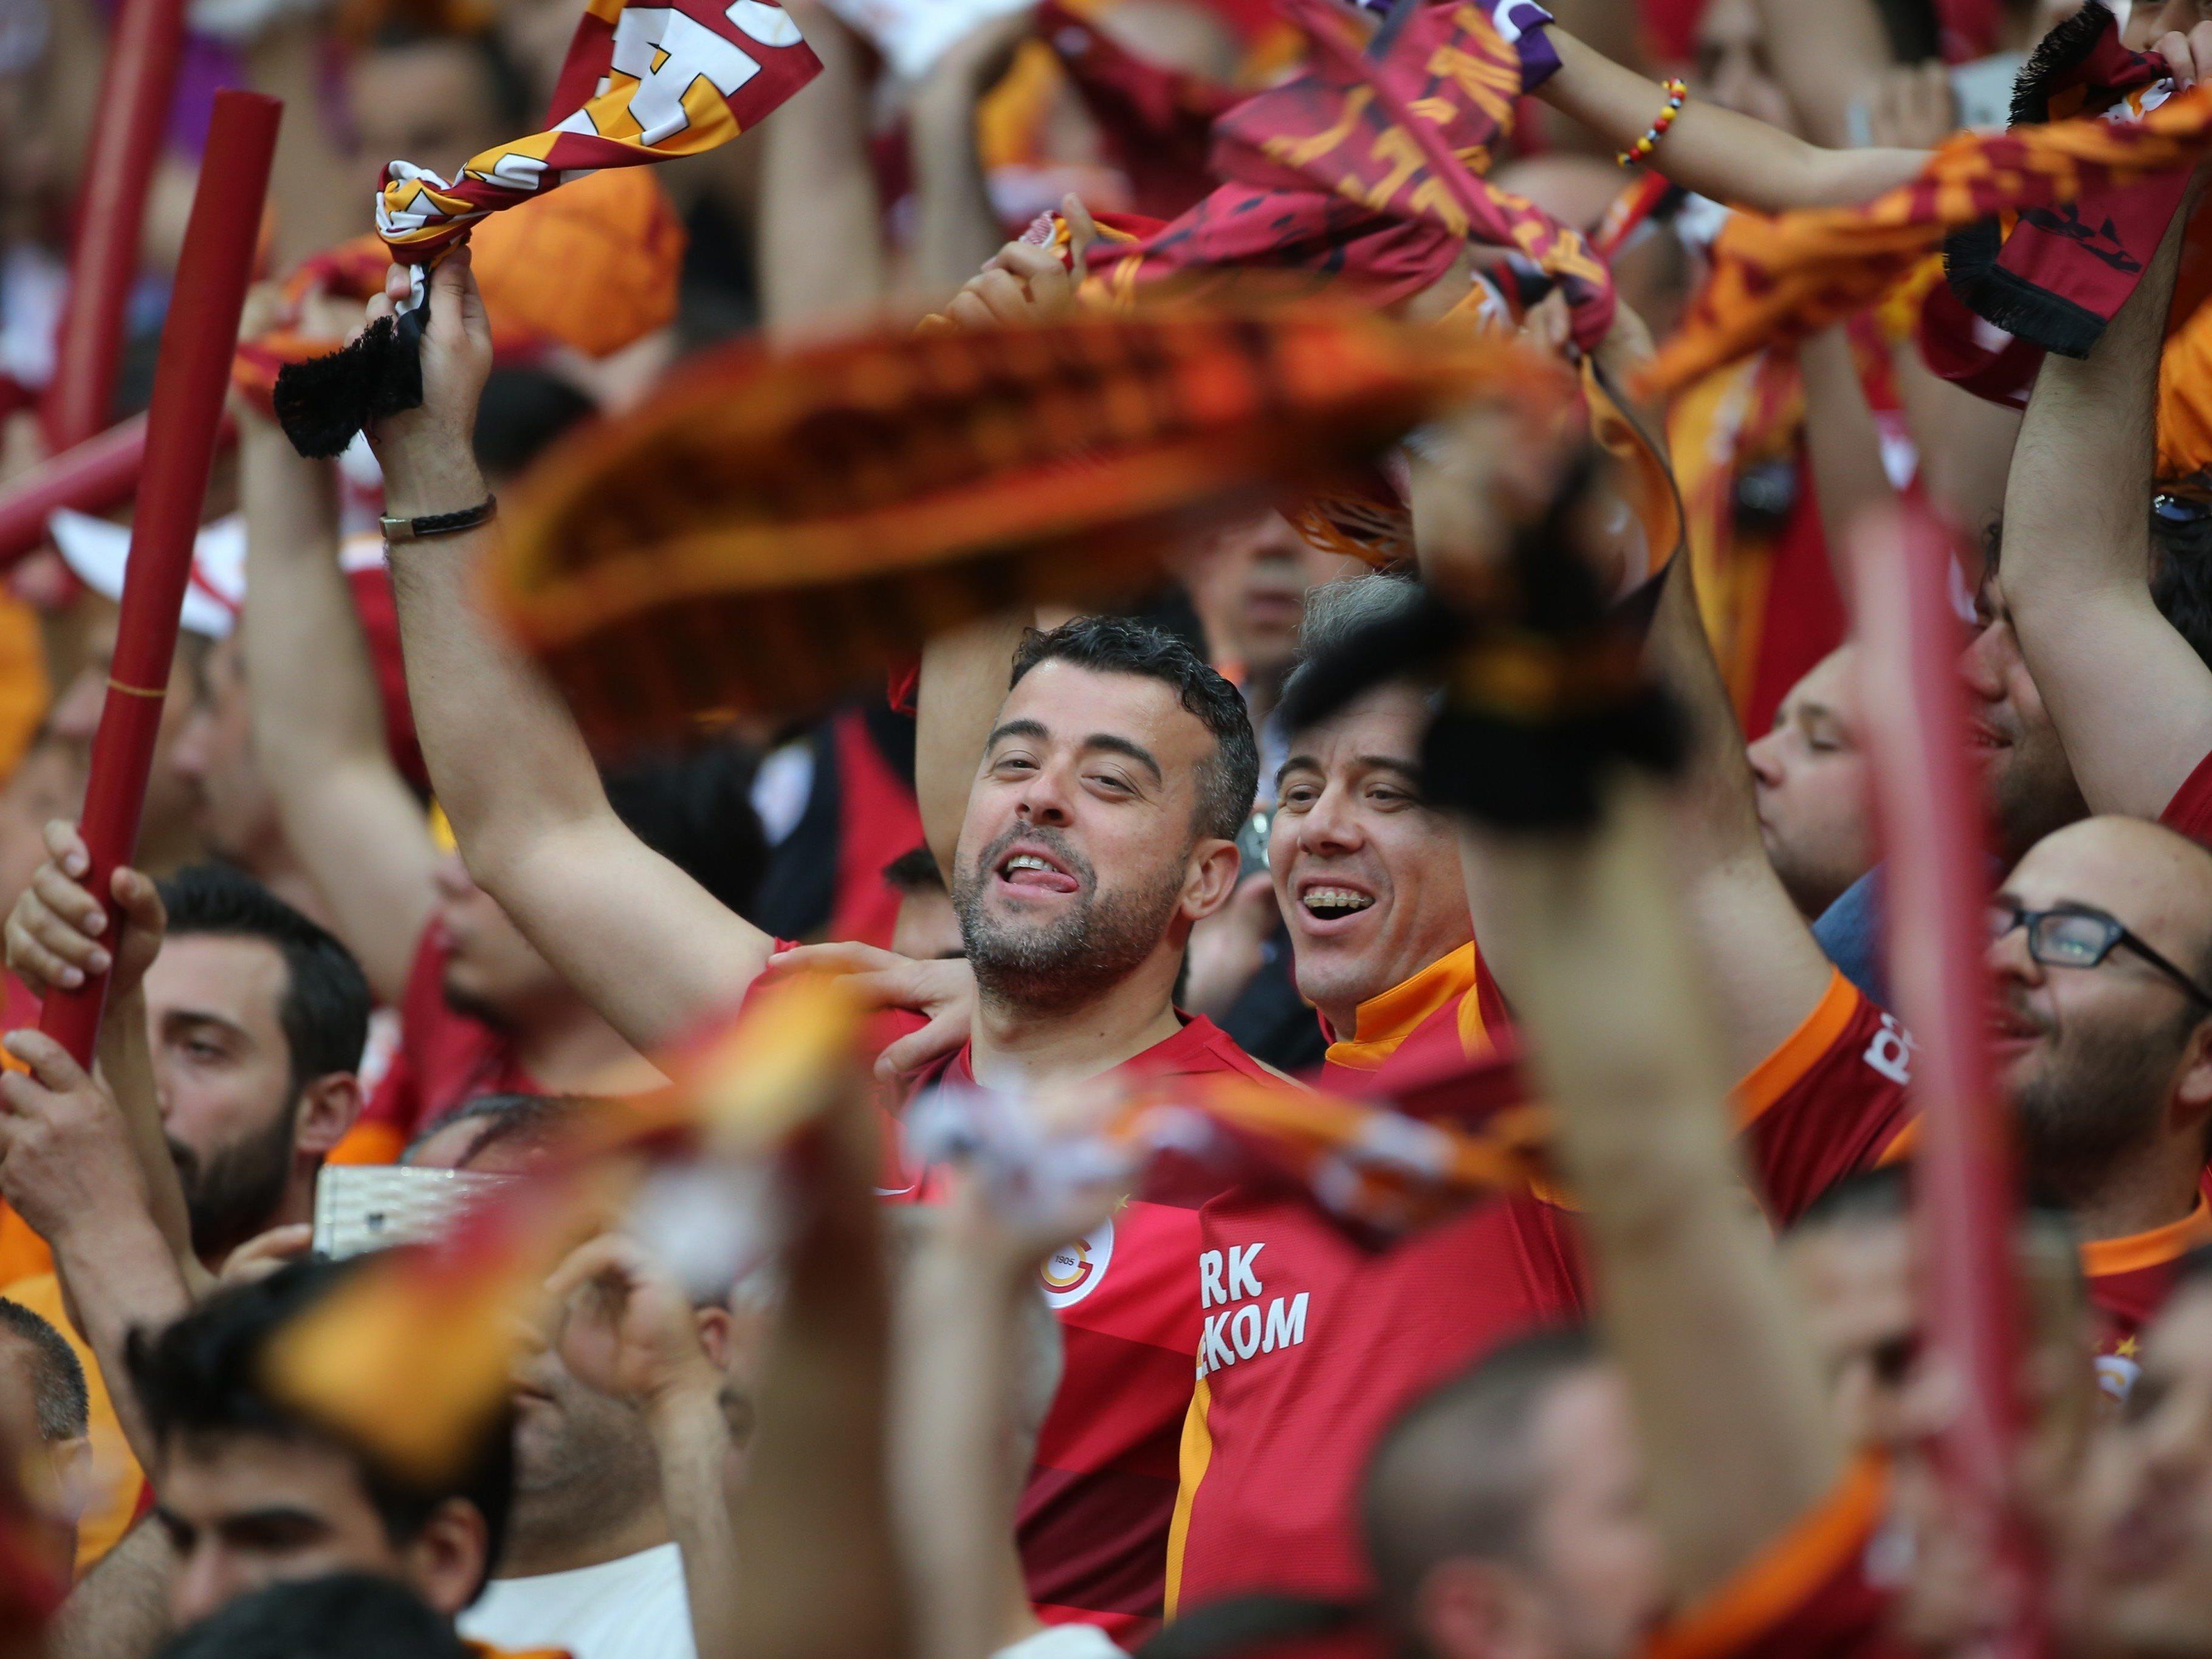 Der Istanbuler Traditionsclub Galatasaray ist uneinholbarer Sieger der Süper Lig.